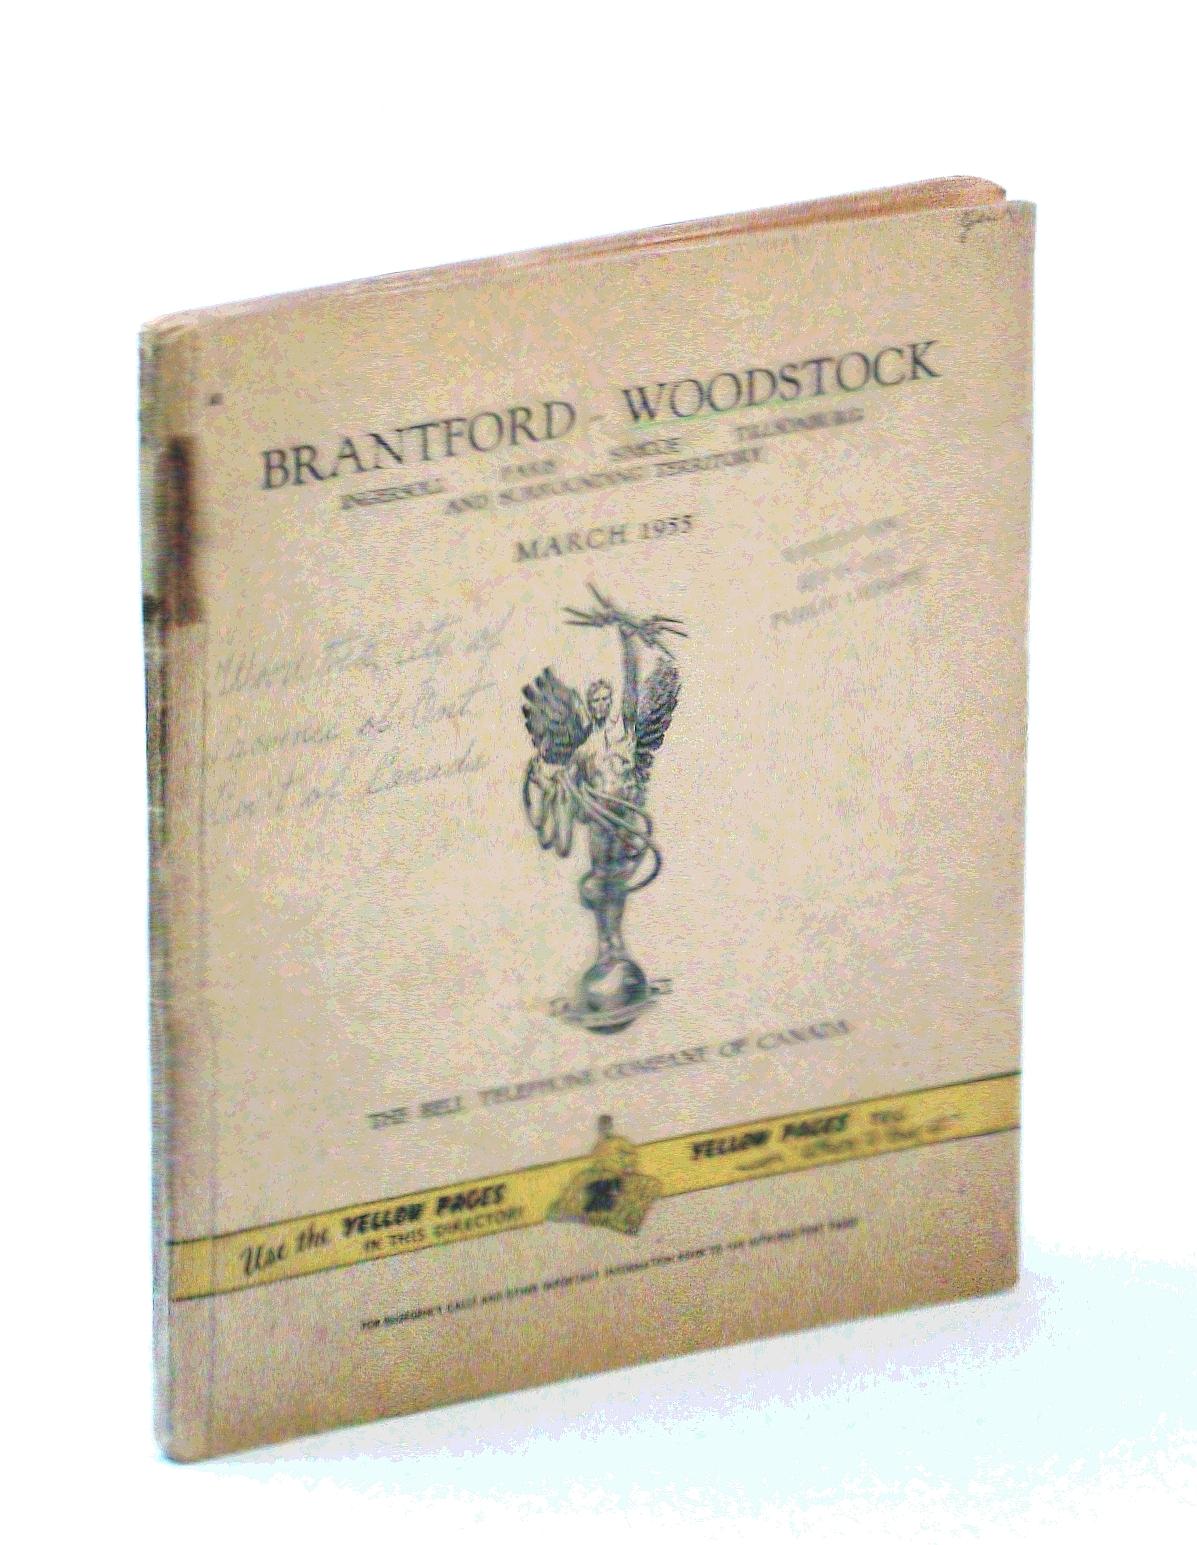 Brantford, Woodstock, Ingersoll, Paris, Simcoe, Tillsonburg [Ontario] and  Surrounding Area March 1955 Phone Book / Phonebook / Phone Directory /  White